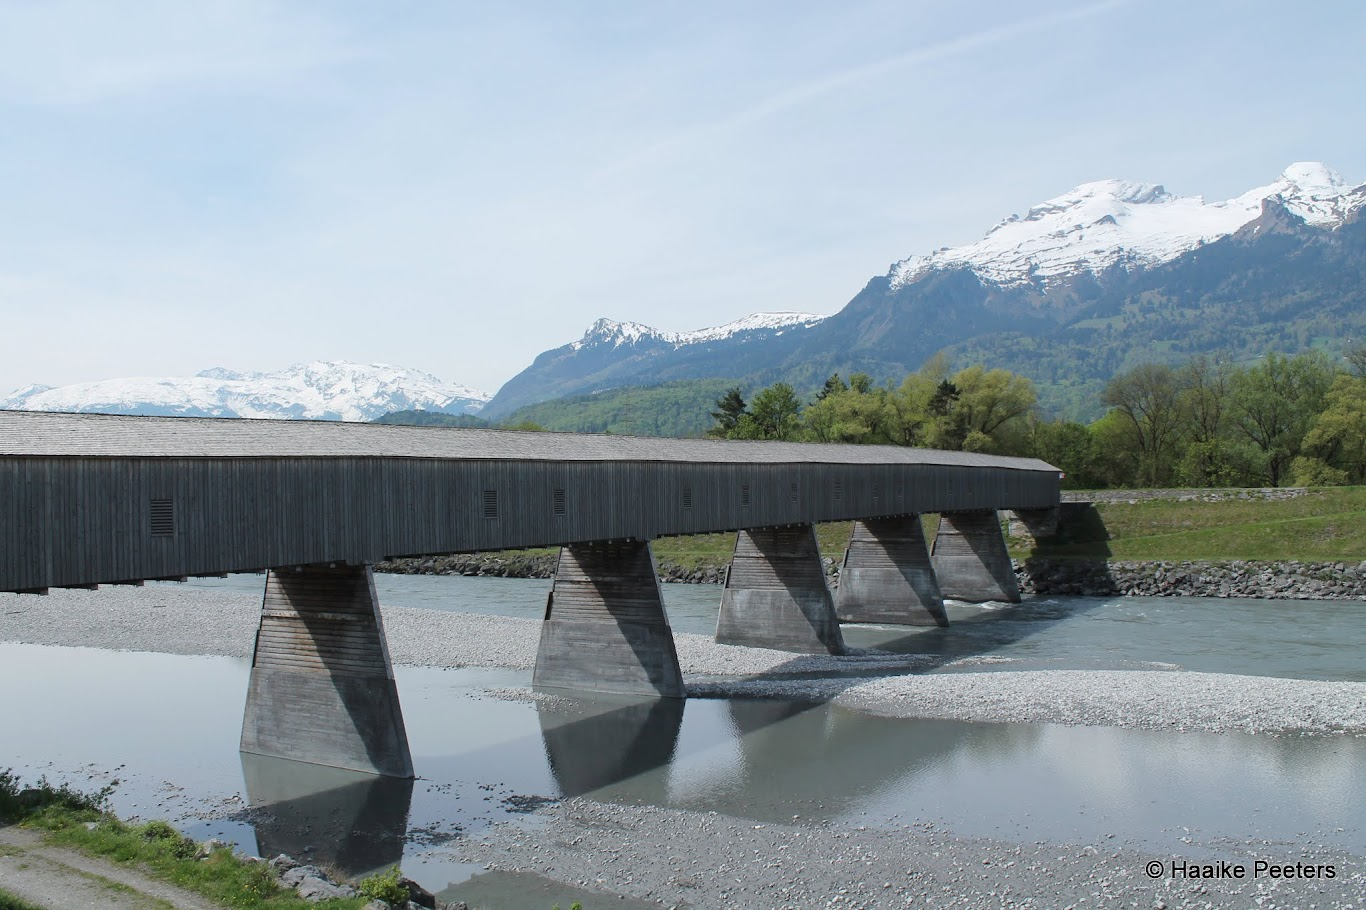 Rheinbrücke Vaduz-Sevelen (Le petit requin)